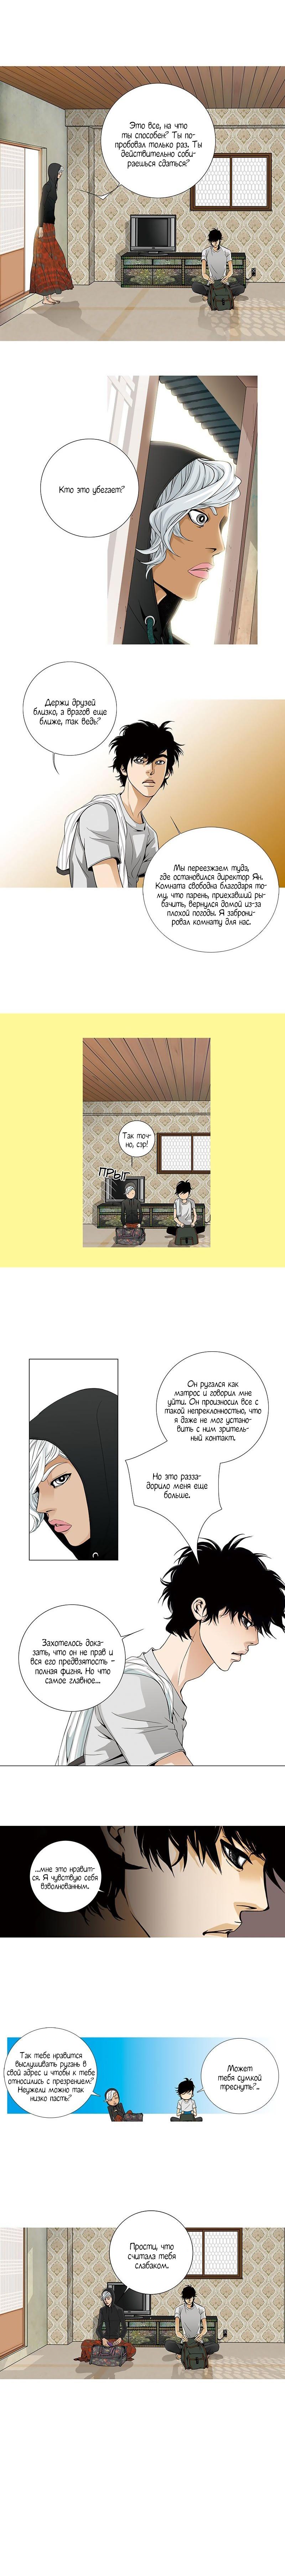 https://r1.ninemanga.com/comics/pic2/29/28573/344320/1512078308944.jpg Page 6